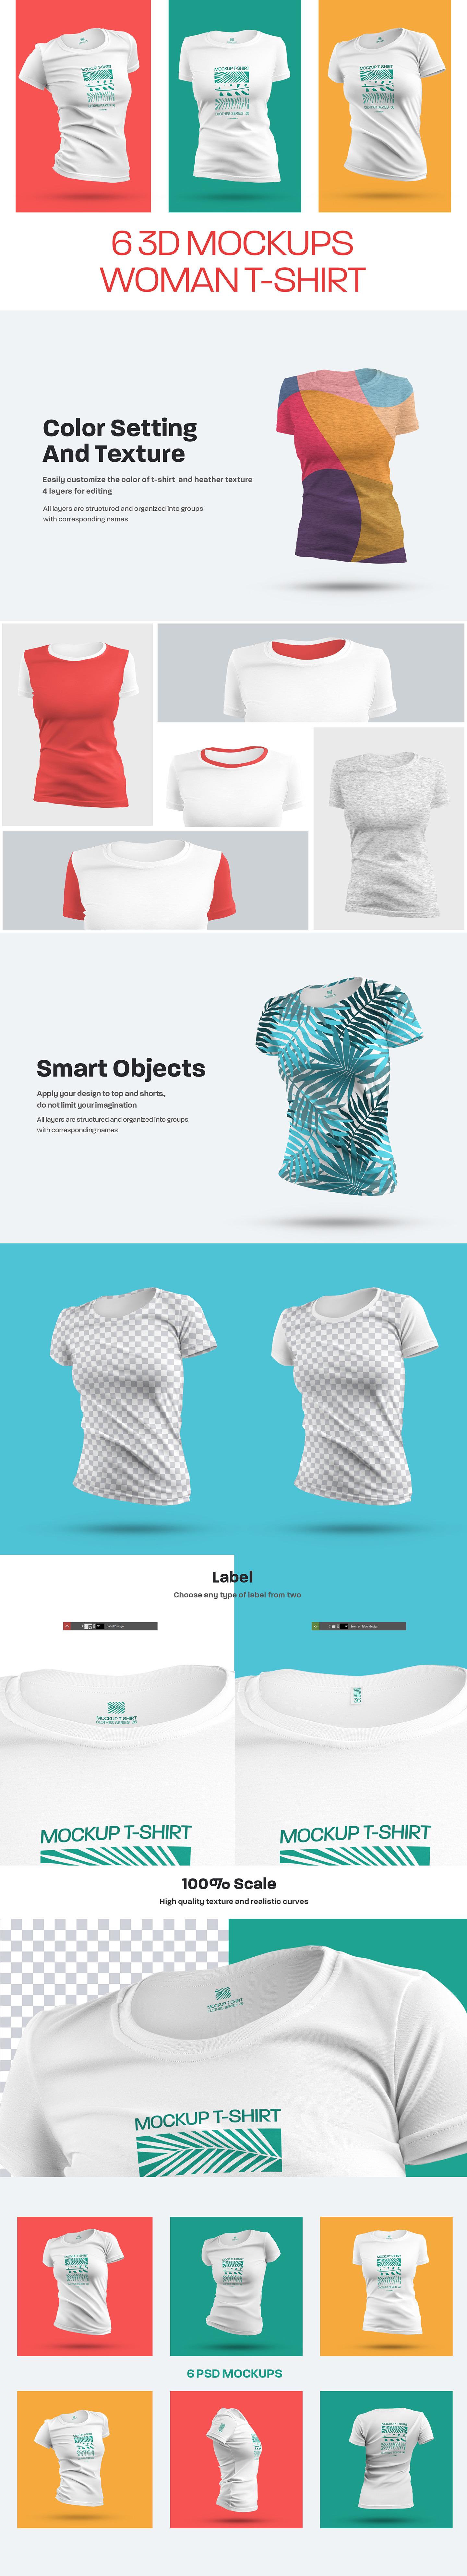 6 3D Mockups Woman T-Shirt